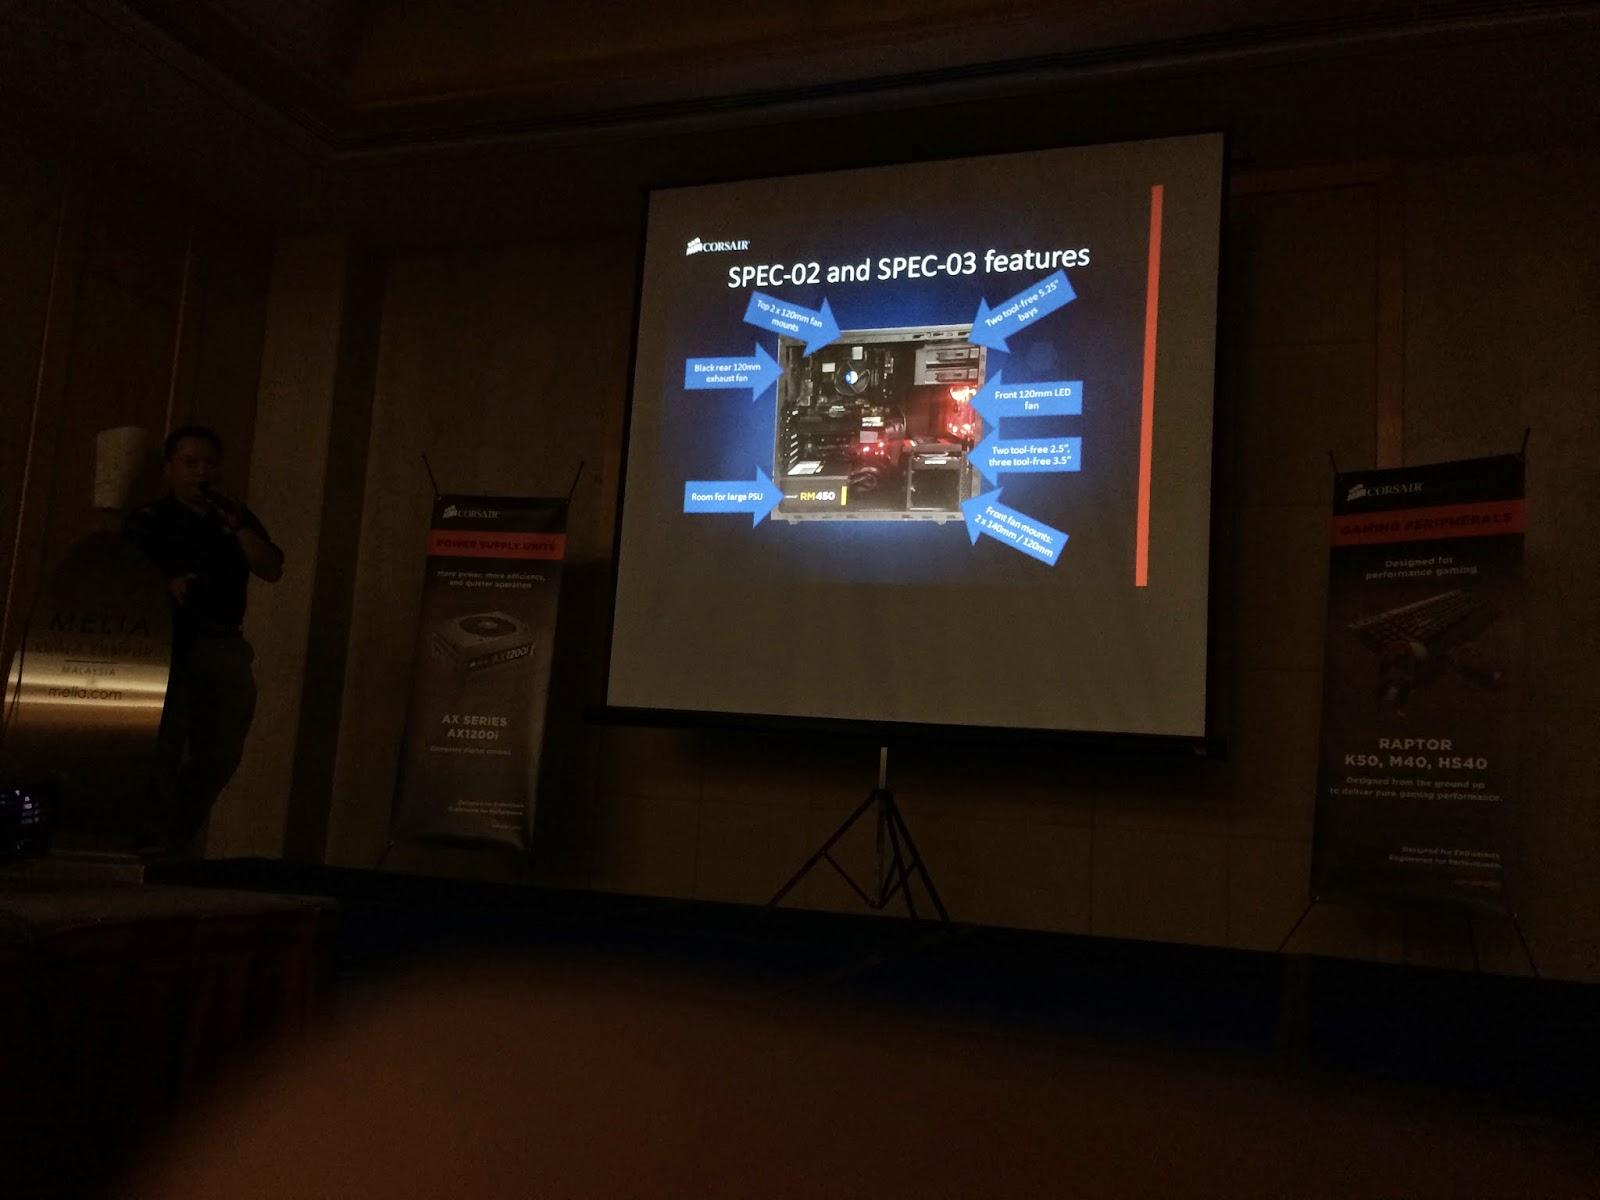 Coverage of Corsair Event @Melia Kuala Lumpur 80